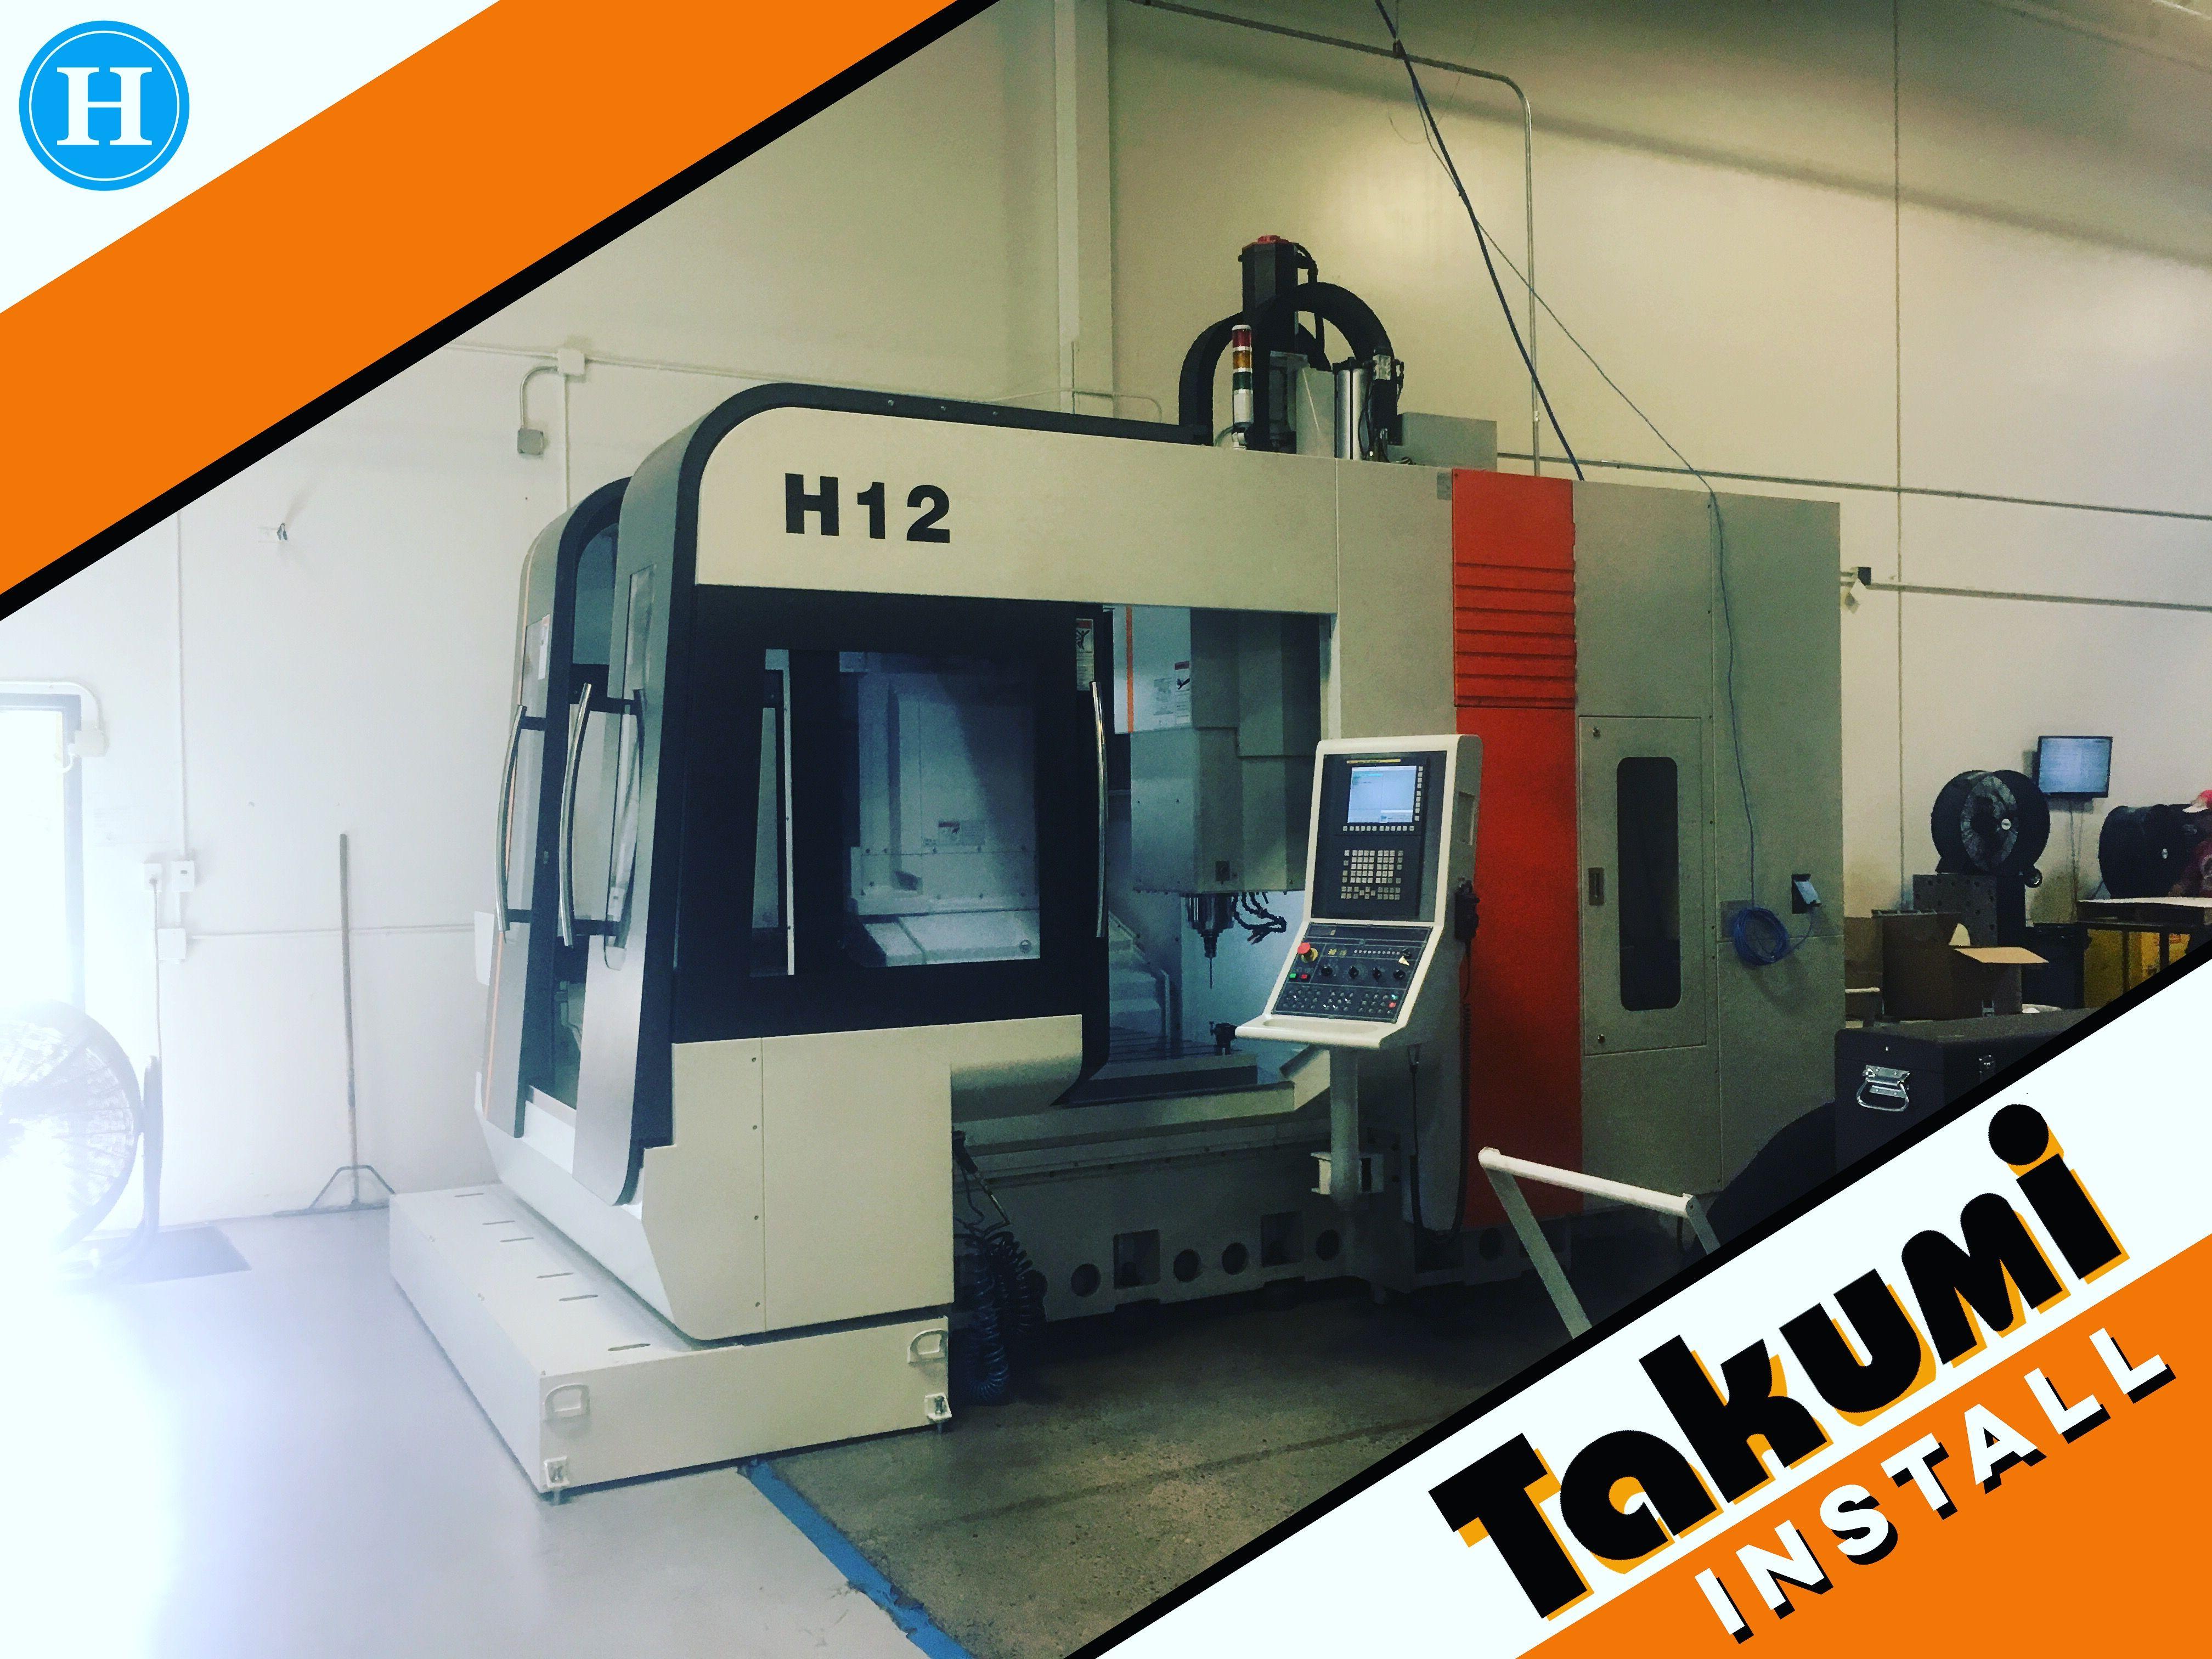 Nice A New Takumi H12 Being Installed Today. Www.humstonmachinery.com U2022 U2022 U2022